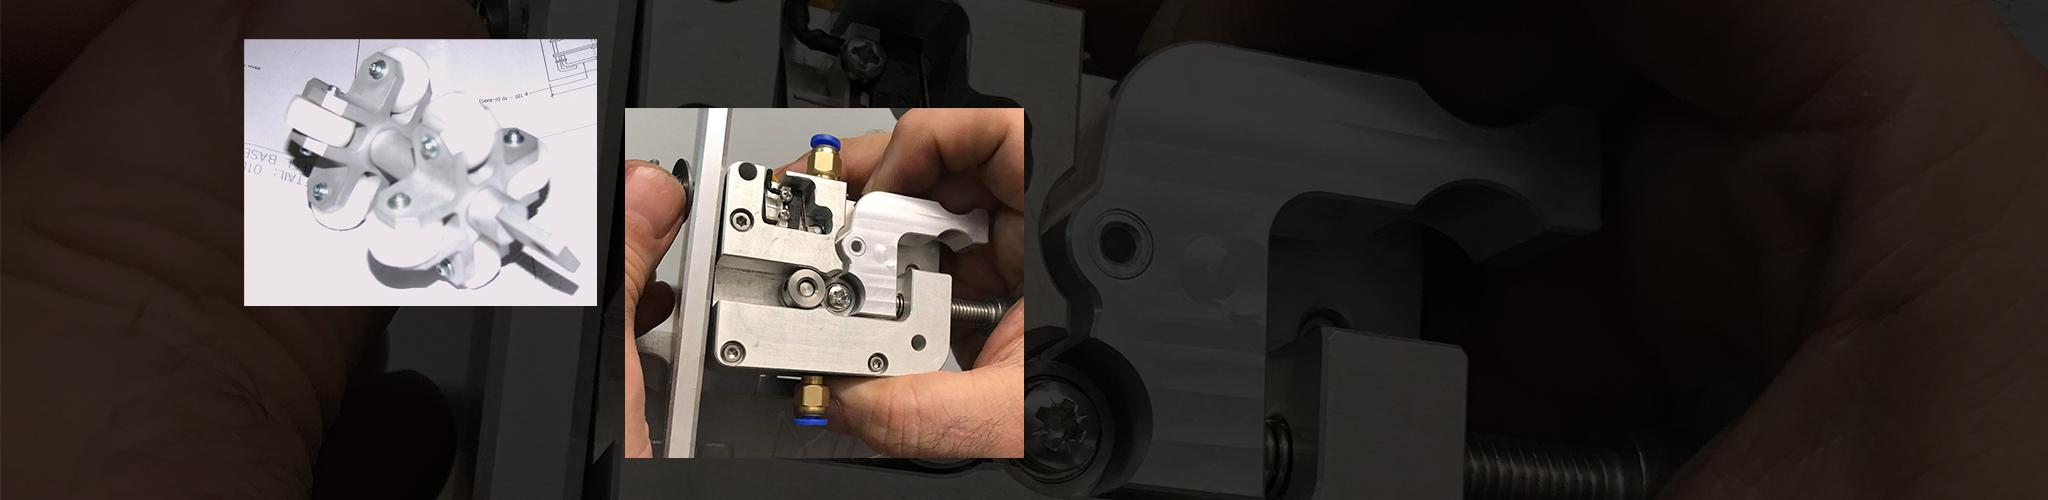 3D_Printing_Machinery_Manufacturing